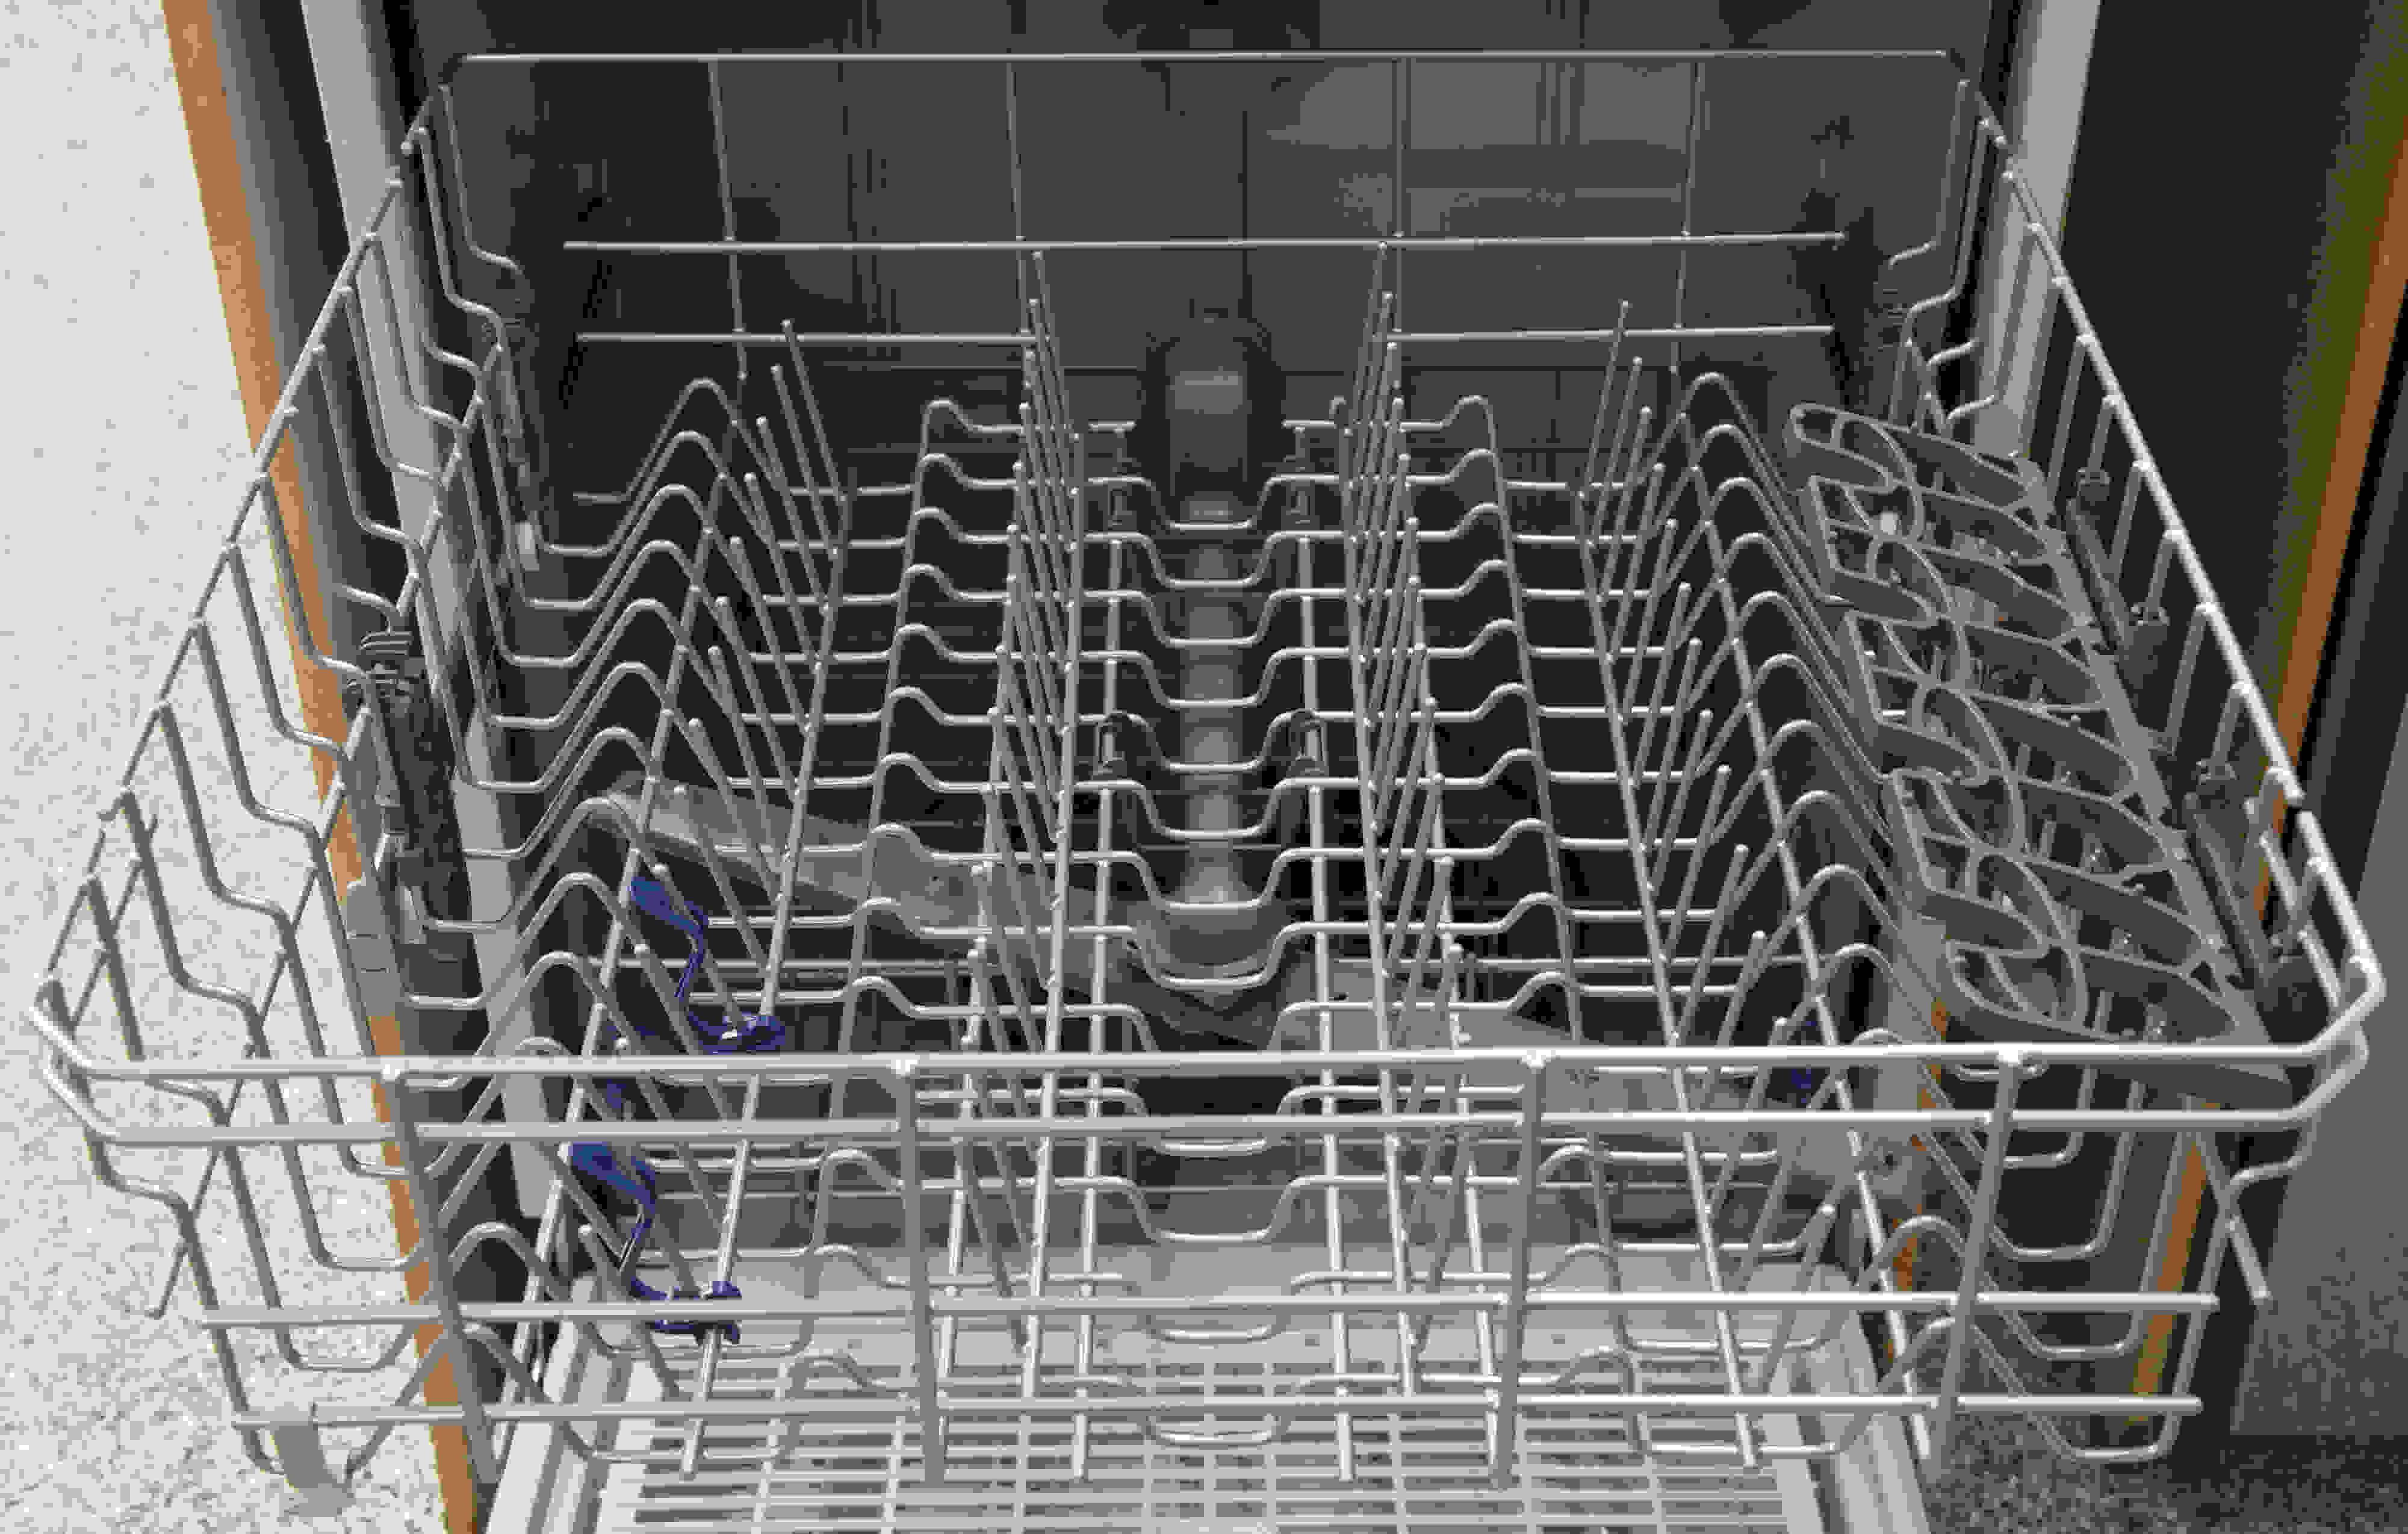 Whirlpool WDF540PADM upper rack